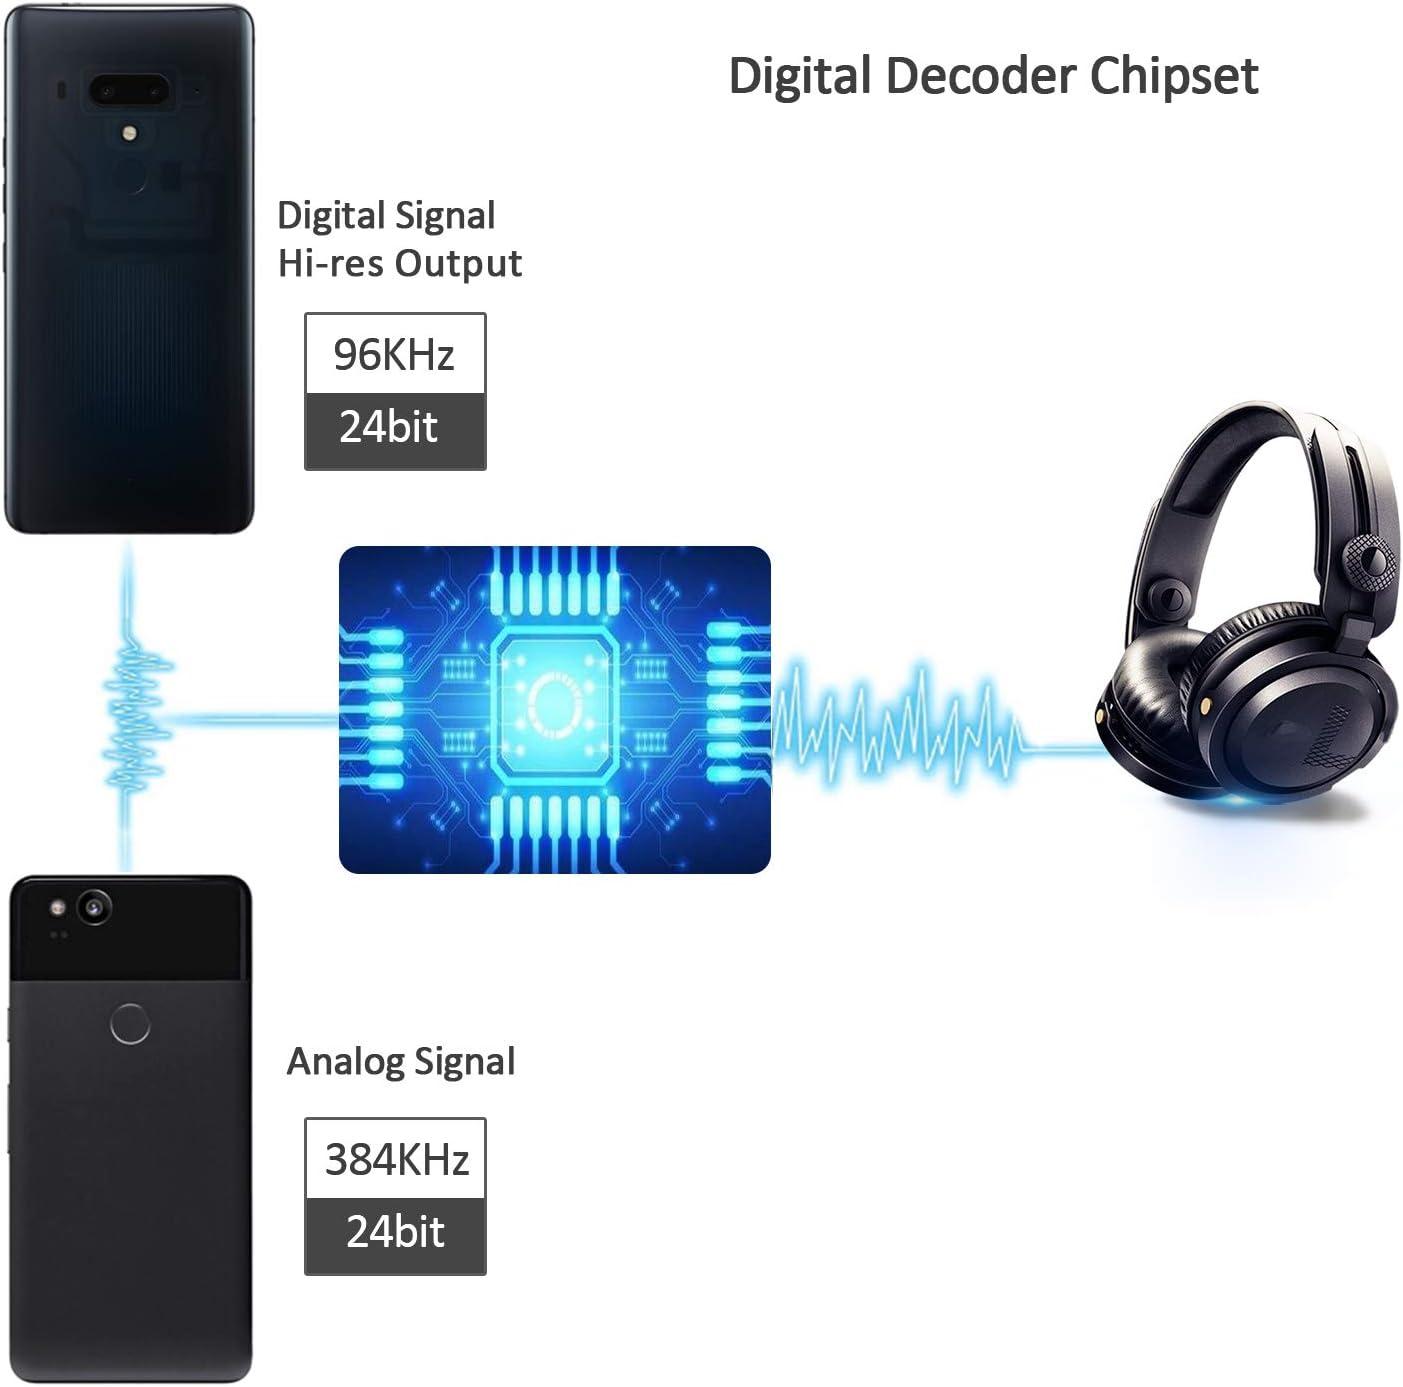 Aux Adaptor for Google Pixel 3//2 XL USB Type C to 3.5mm Audio Headphone Jack Adapter Huawei P30//P20//Pro Mate 20//10//Pro Razer Sony Xperia XA2//XZ2 OnePlus 6//6T Hi-Res /& Digital Chipset